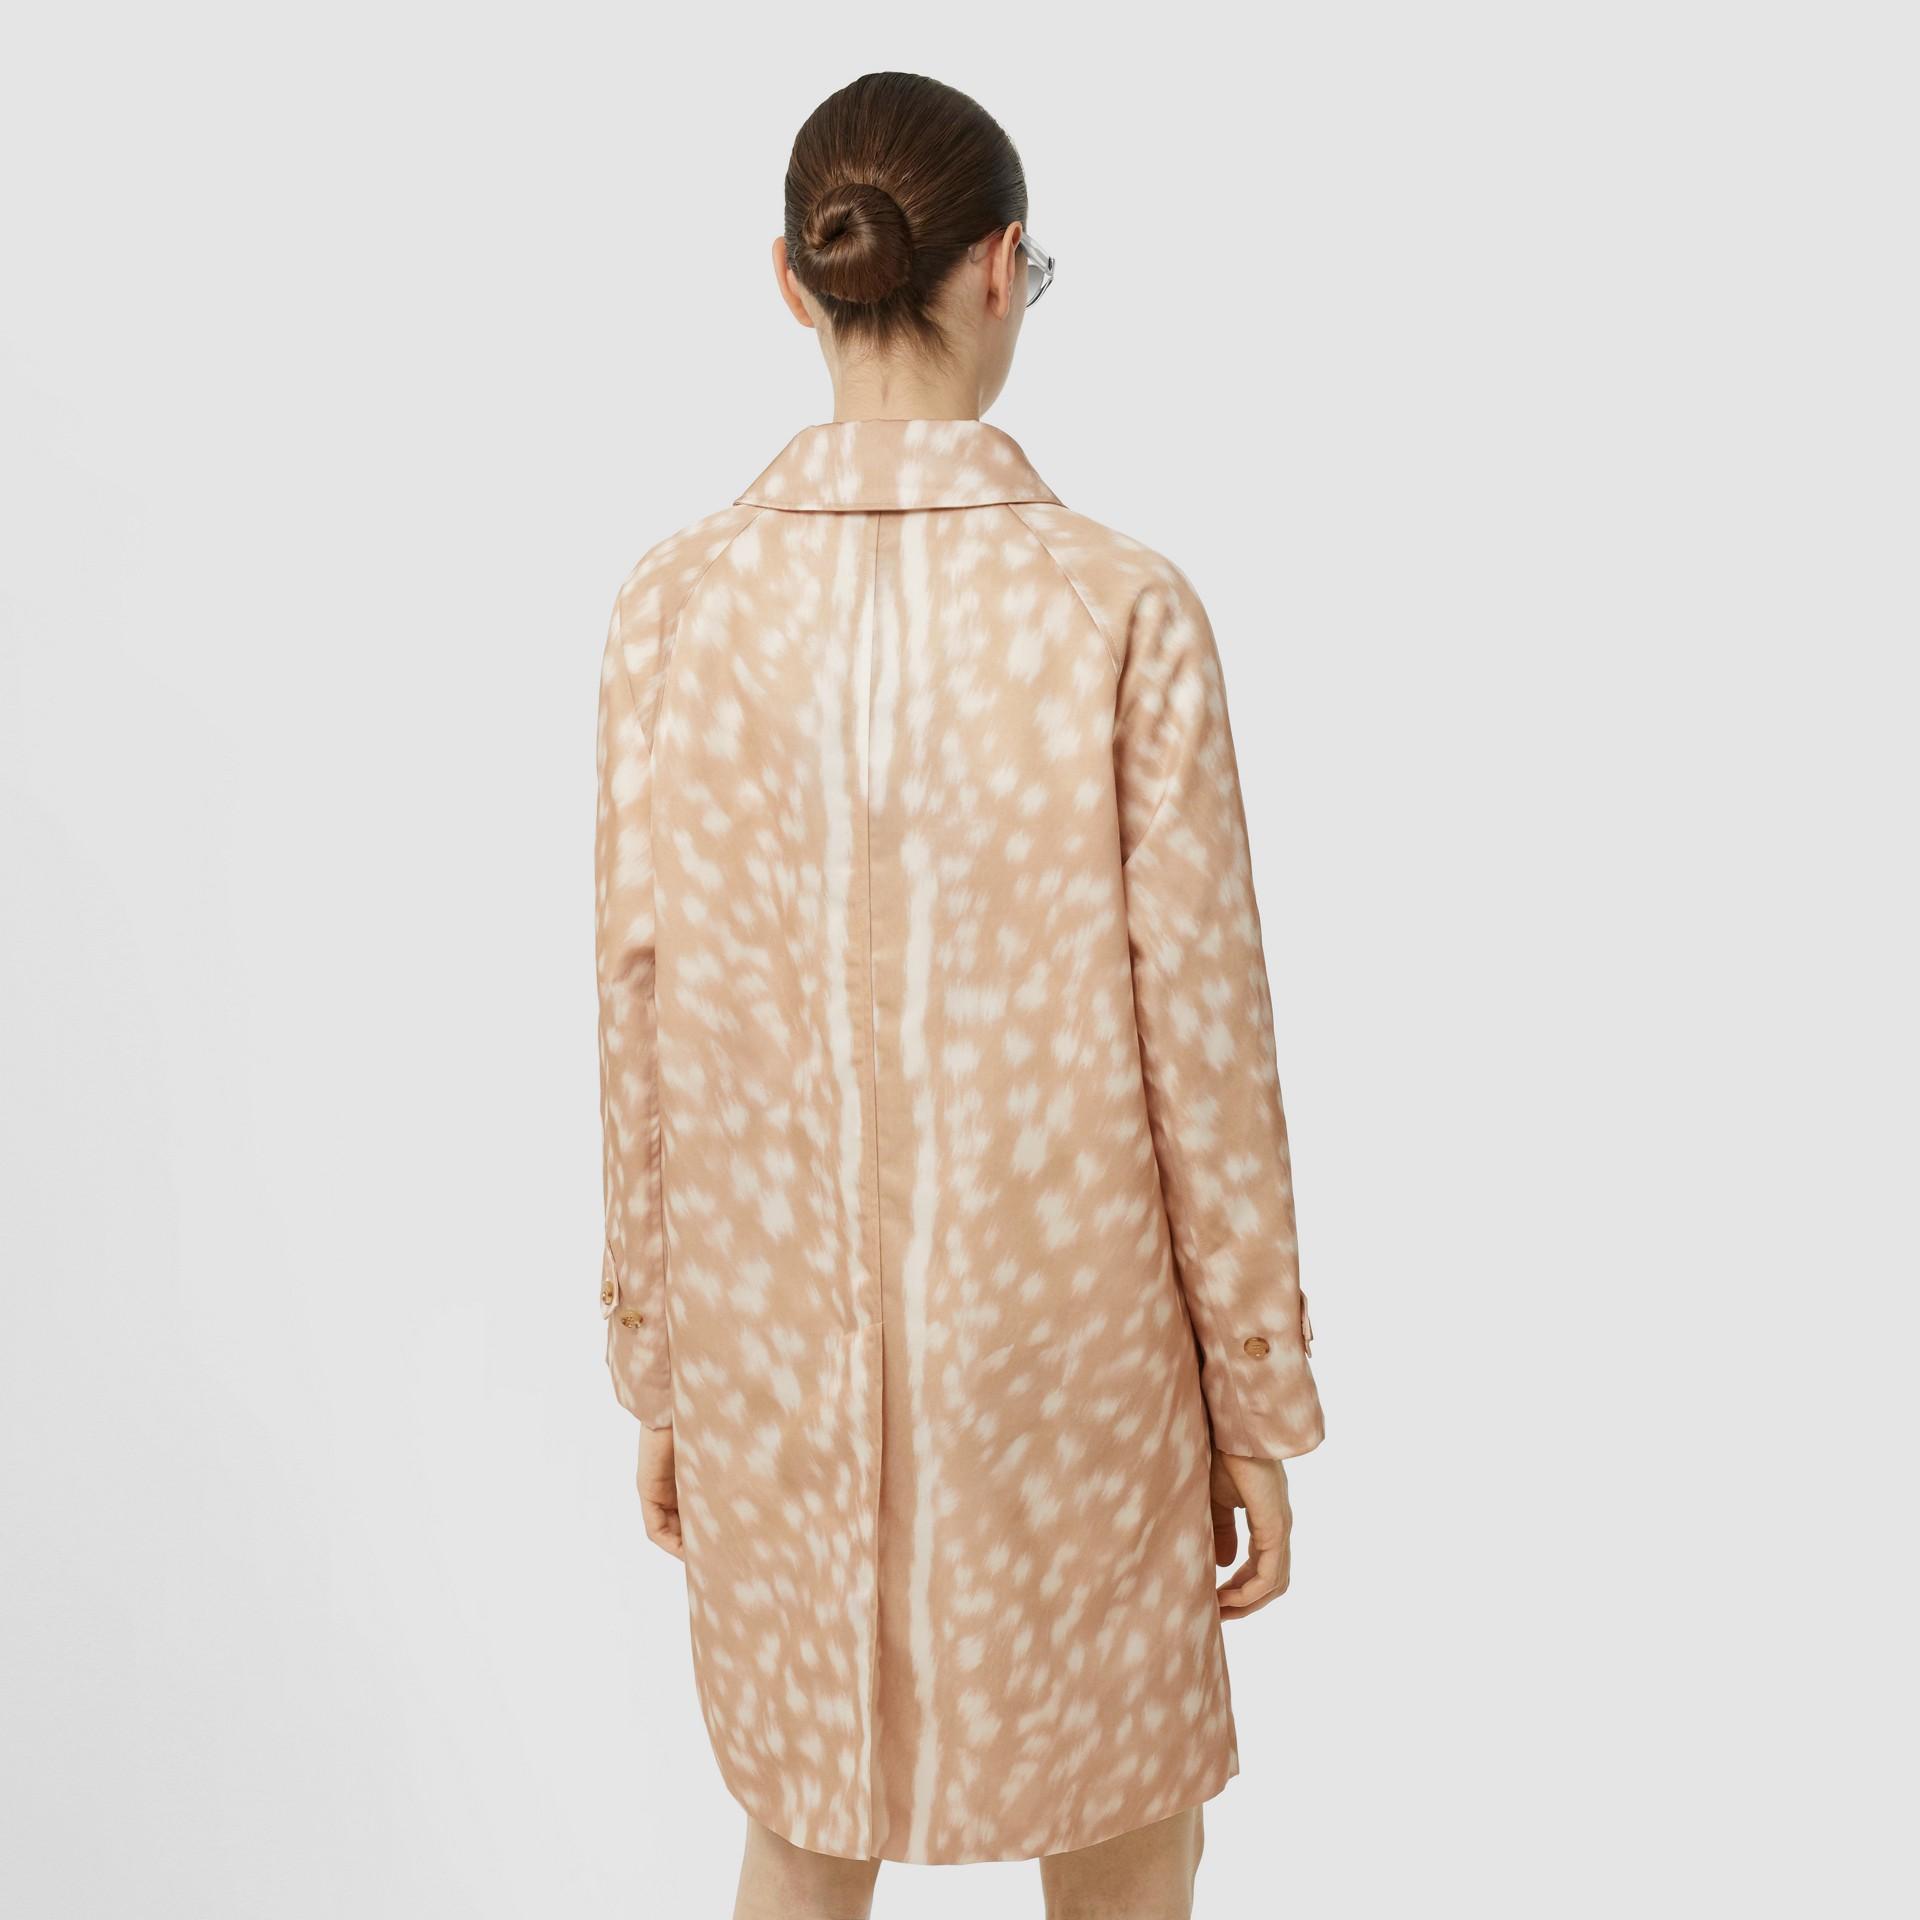 Deer Print Nylon Car Coat in Soft Fawn - Women | Burberry Singapore - gallery image 2